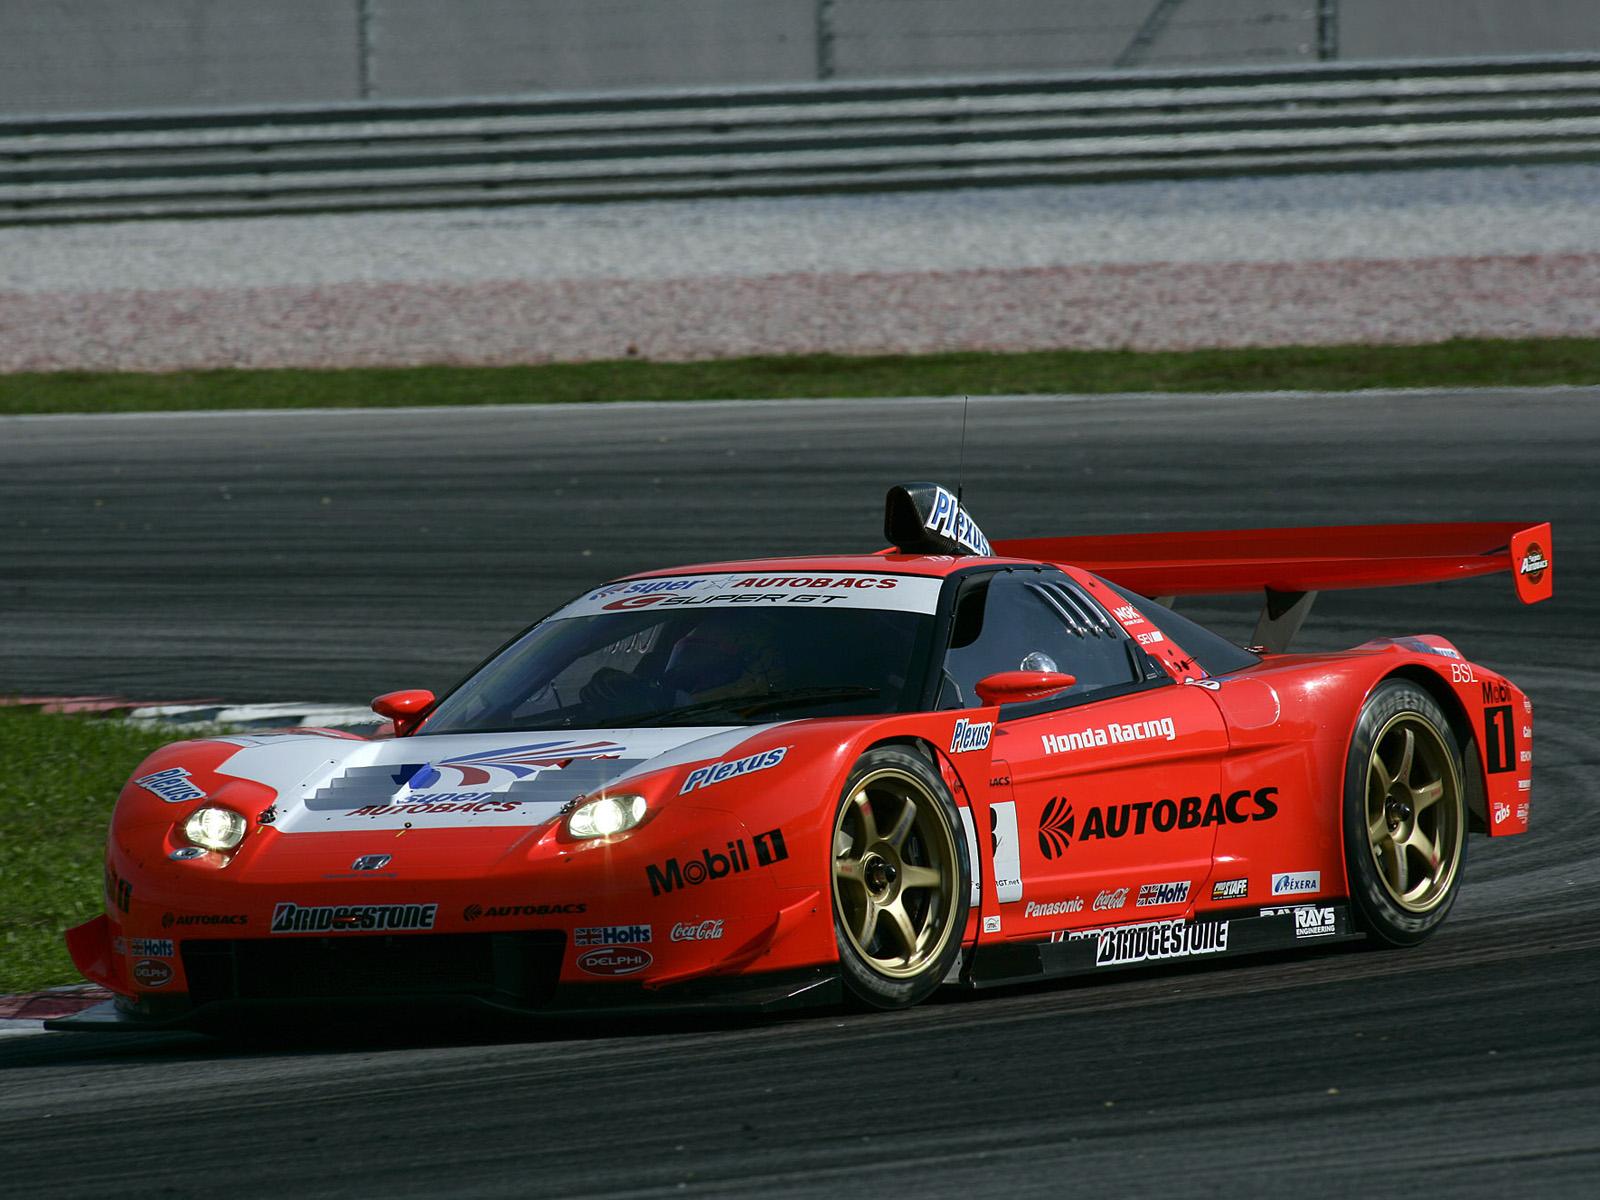 Race Car Wallpaper Images 2002aei10 Honda Nsx Gt500 Na2 Race Racing Supercar